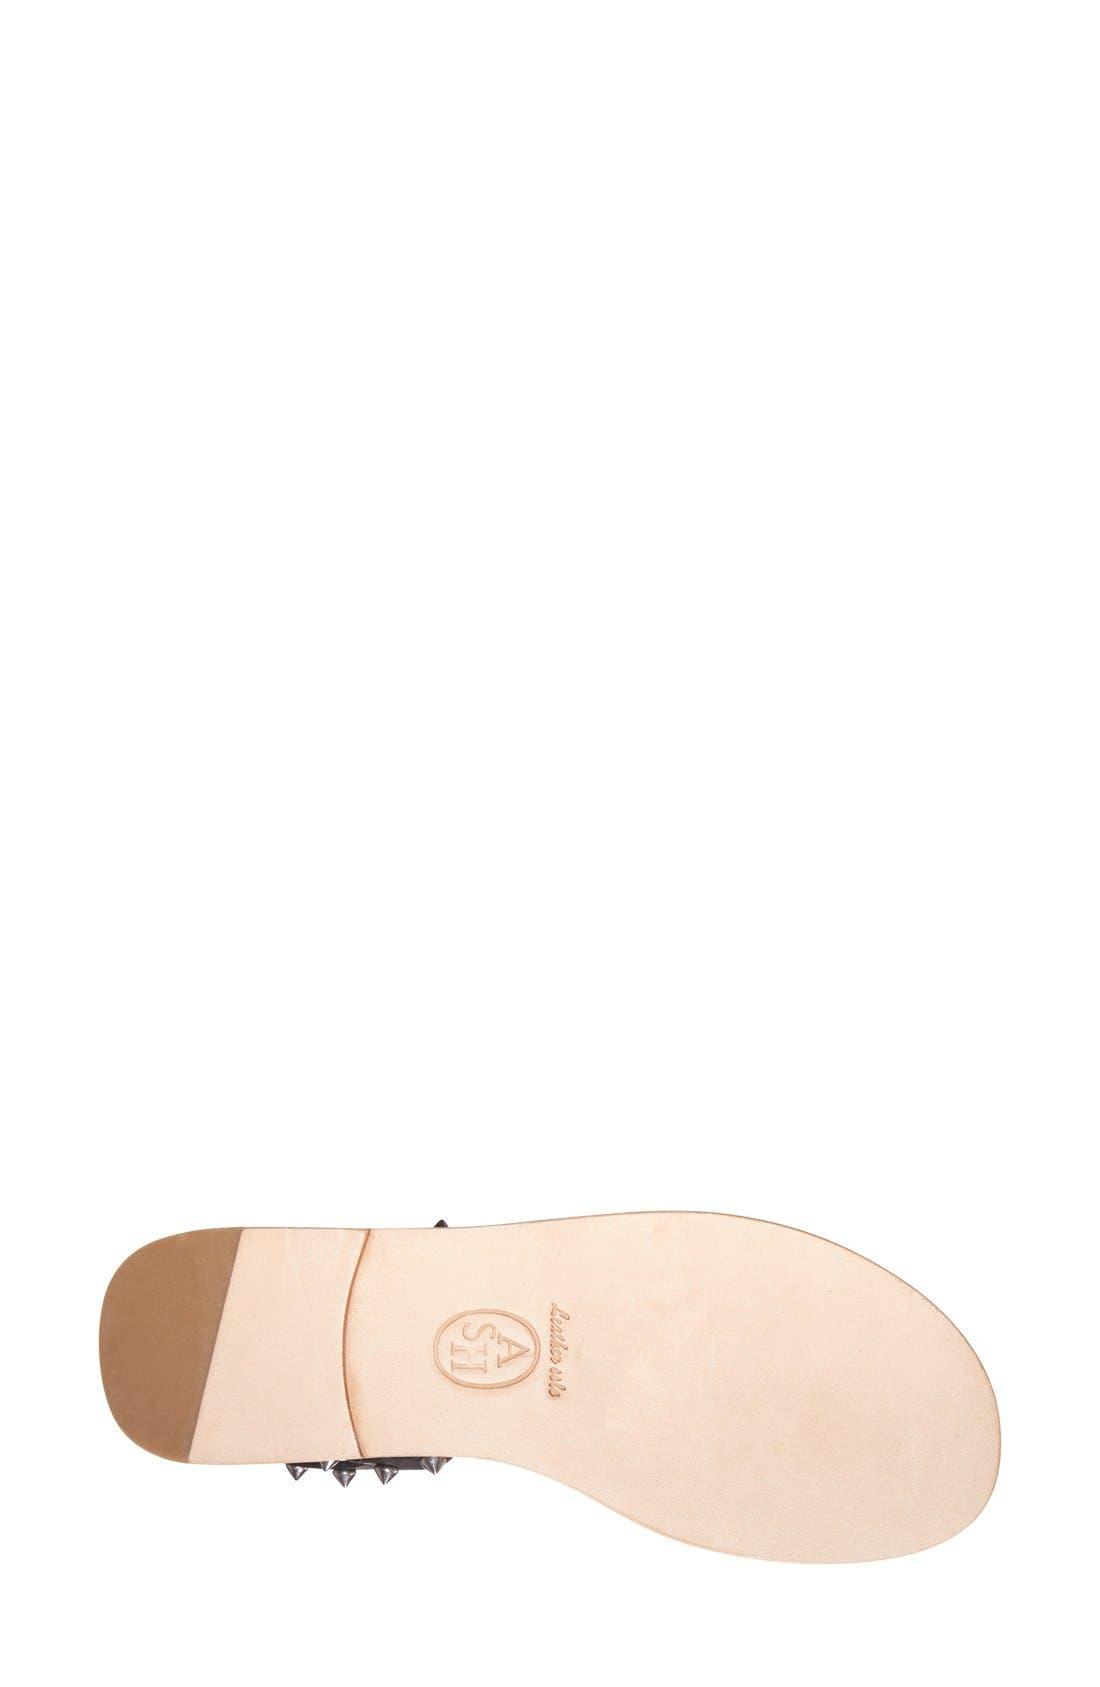 'Pearl' Studded Leather Sandal,                             Alternate thumbnail 2, color,                             001